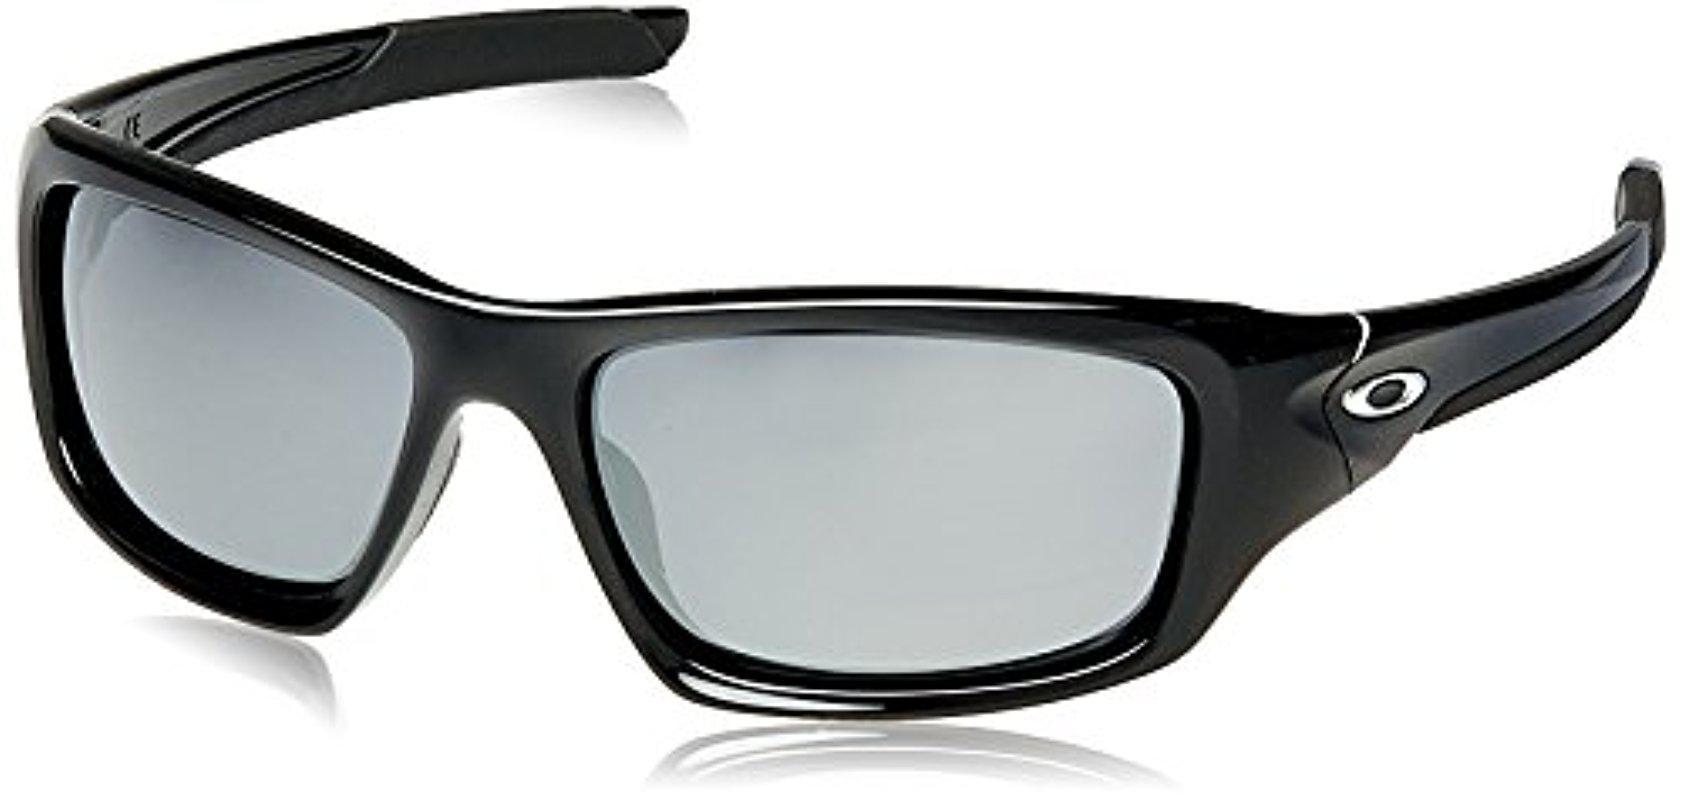 e804eb2d8a8 Lyst - Oakley Valve Non-polarized Iridium Rectangular Sunglasses in ...